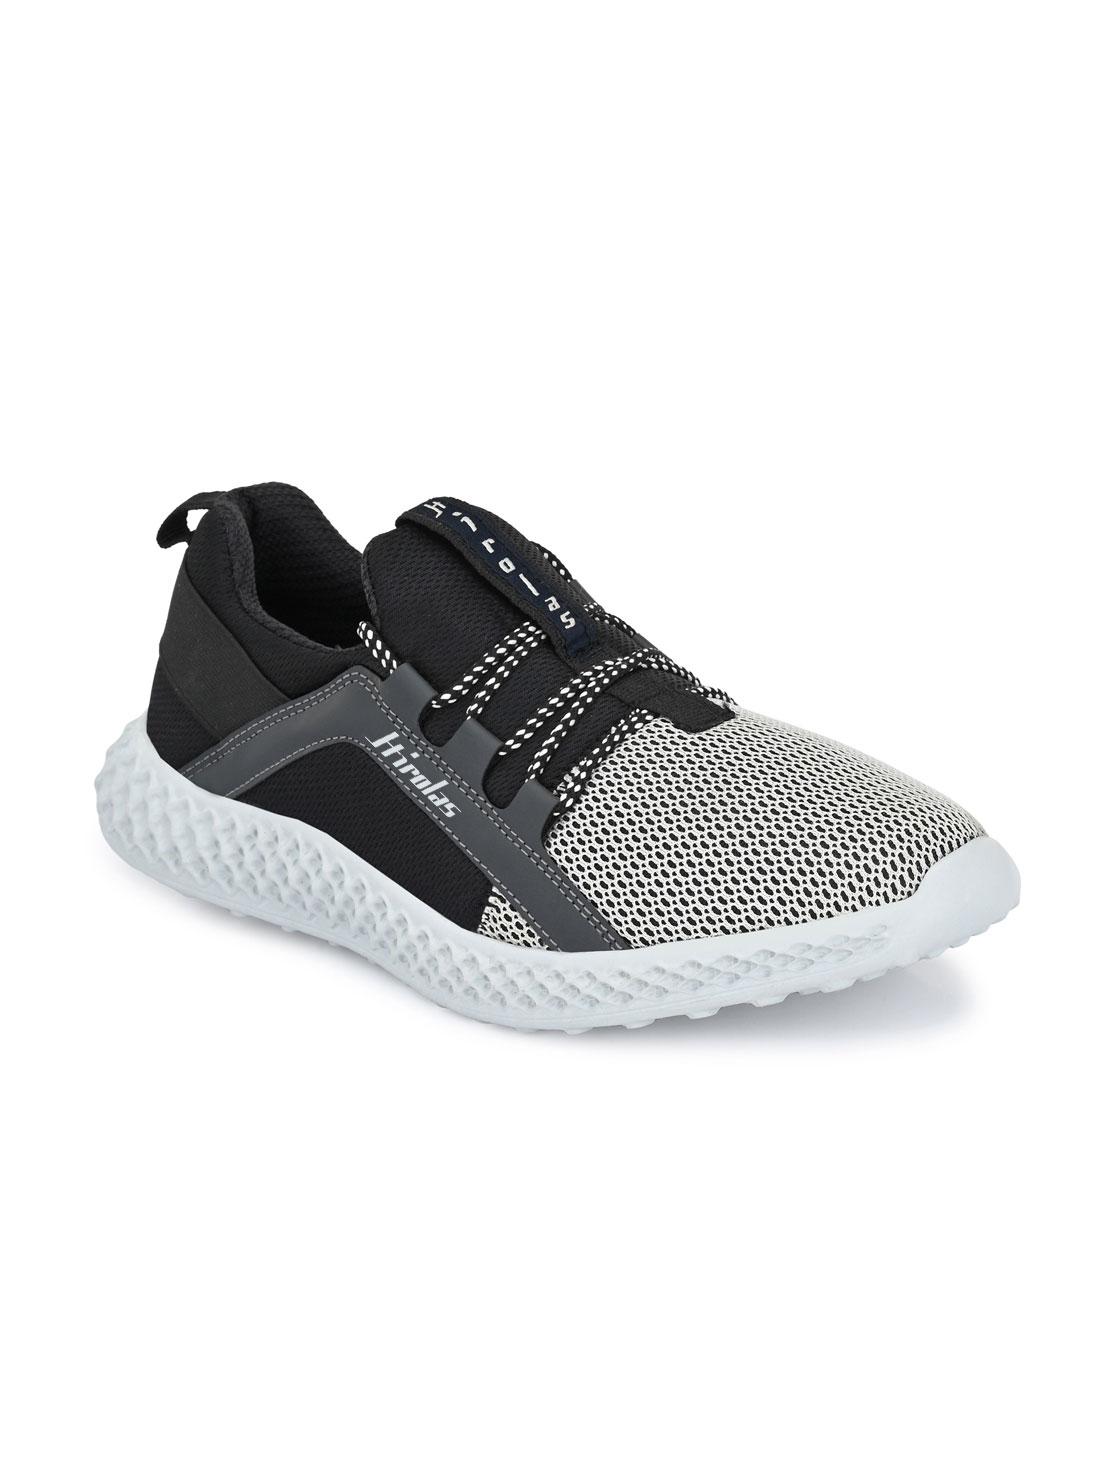 Hirolas | Hirolas® Men's Mesh Grey Gym/Running/Walking Sports Sneaker Shoes